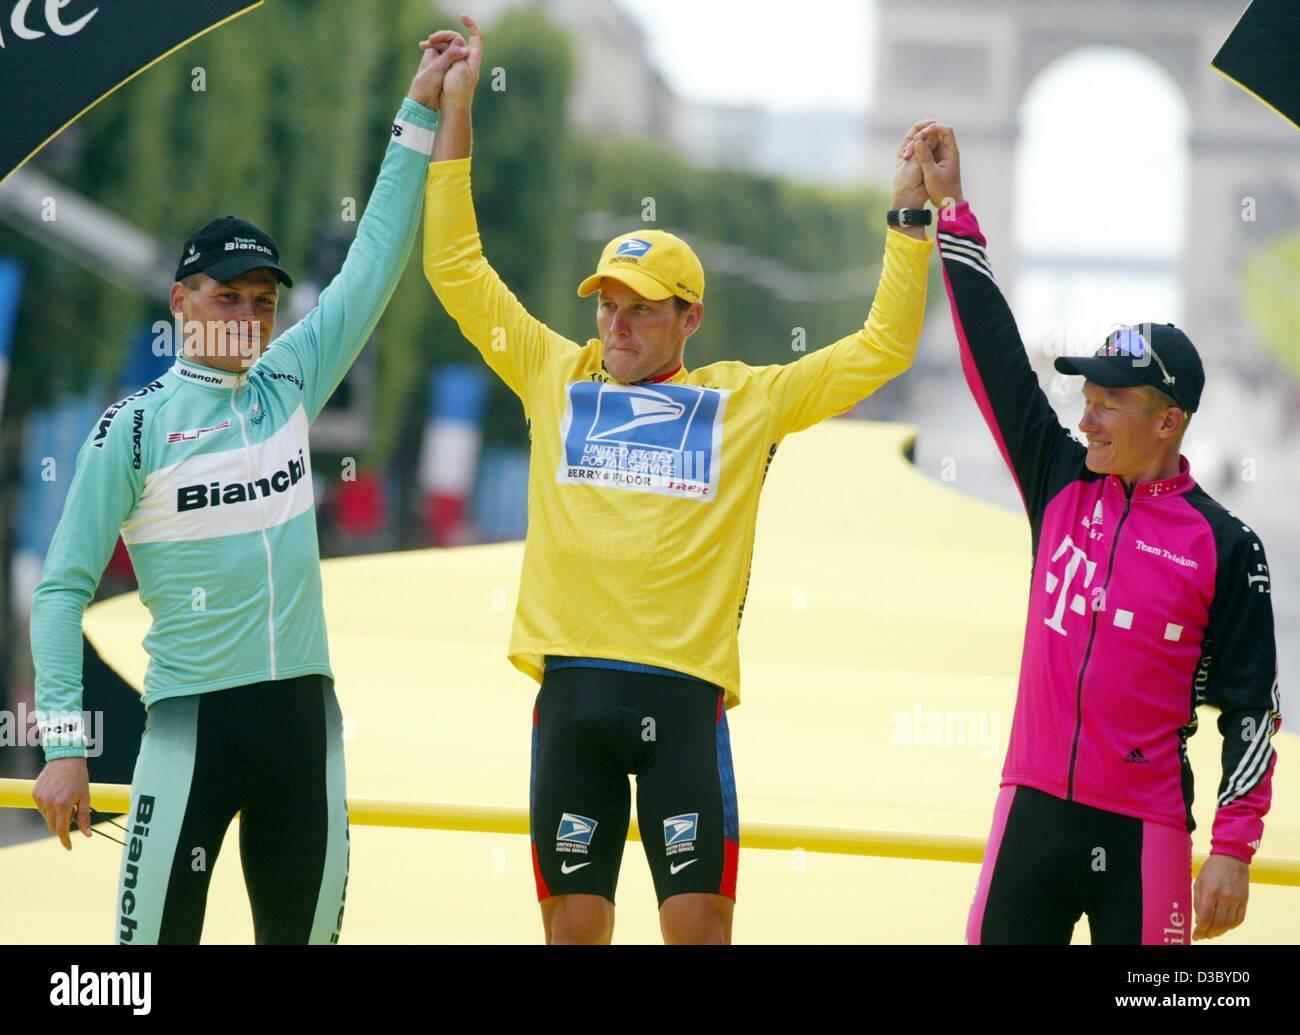 Dpa German Jan Ullrich Team Stock Photos   Dpa German Jan Ullrich ... 3cc867783